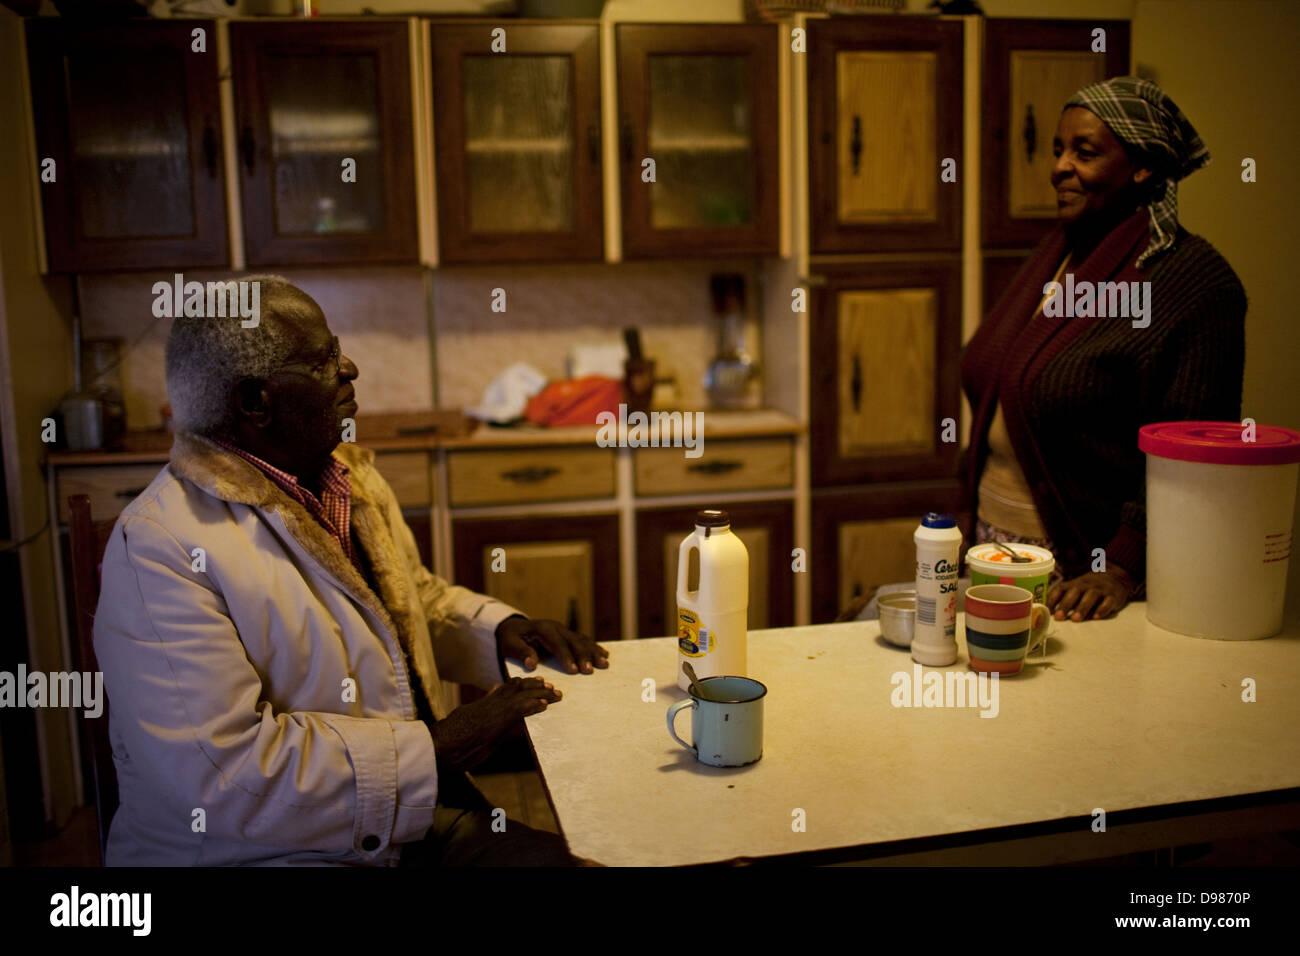 Talks To His Wife Stockfotos & Talks To His Wife Bilder - Alamy